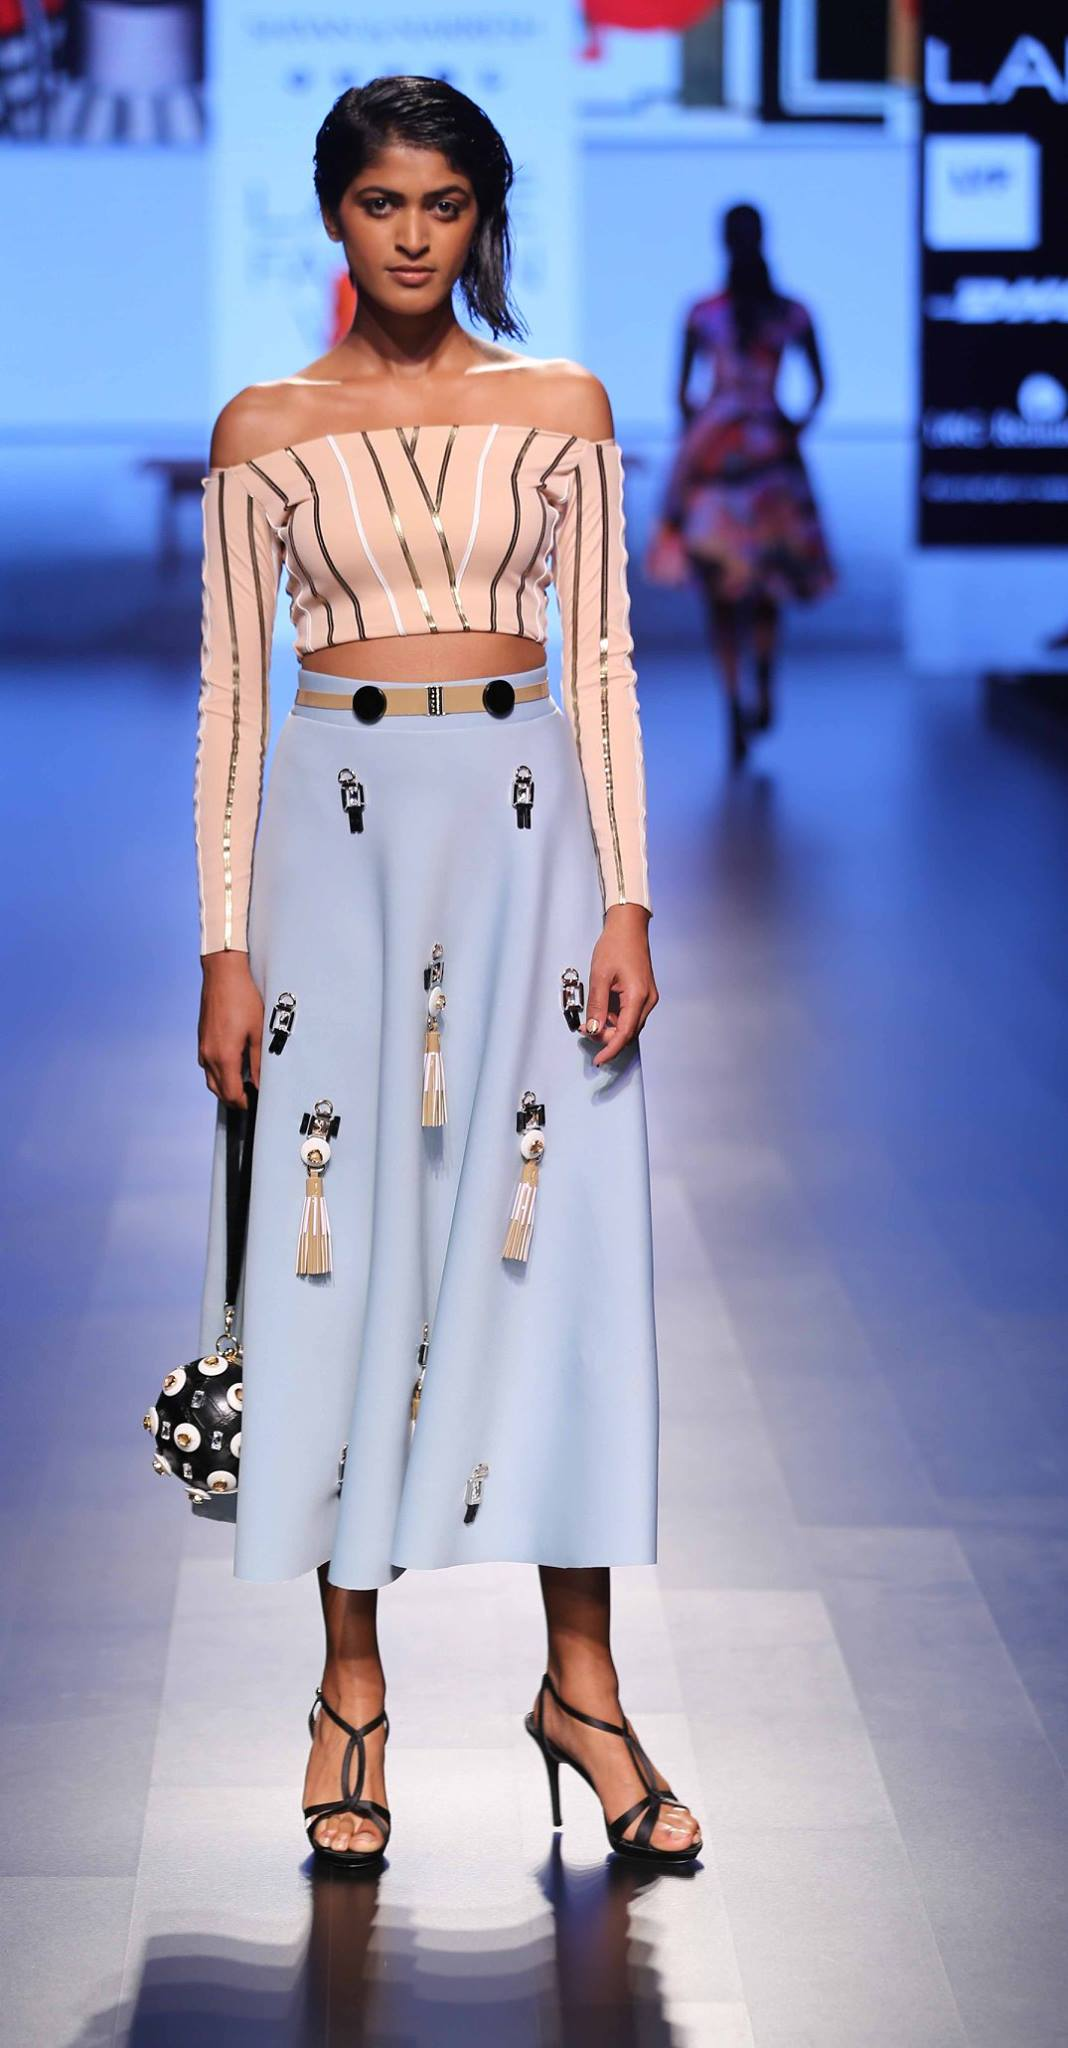 Lakme fashion slip up Candice Michelle - Wikipedia